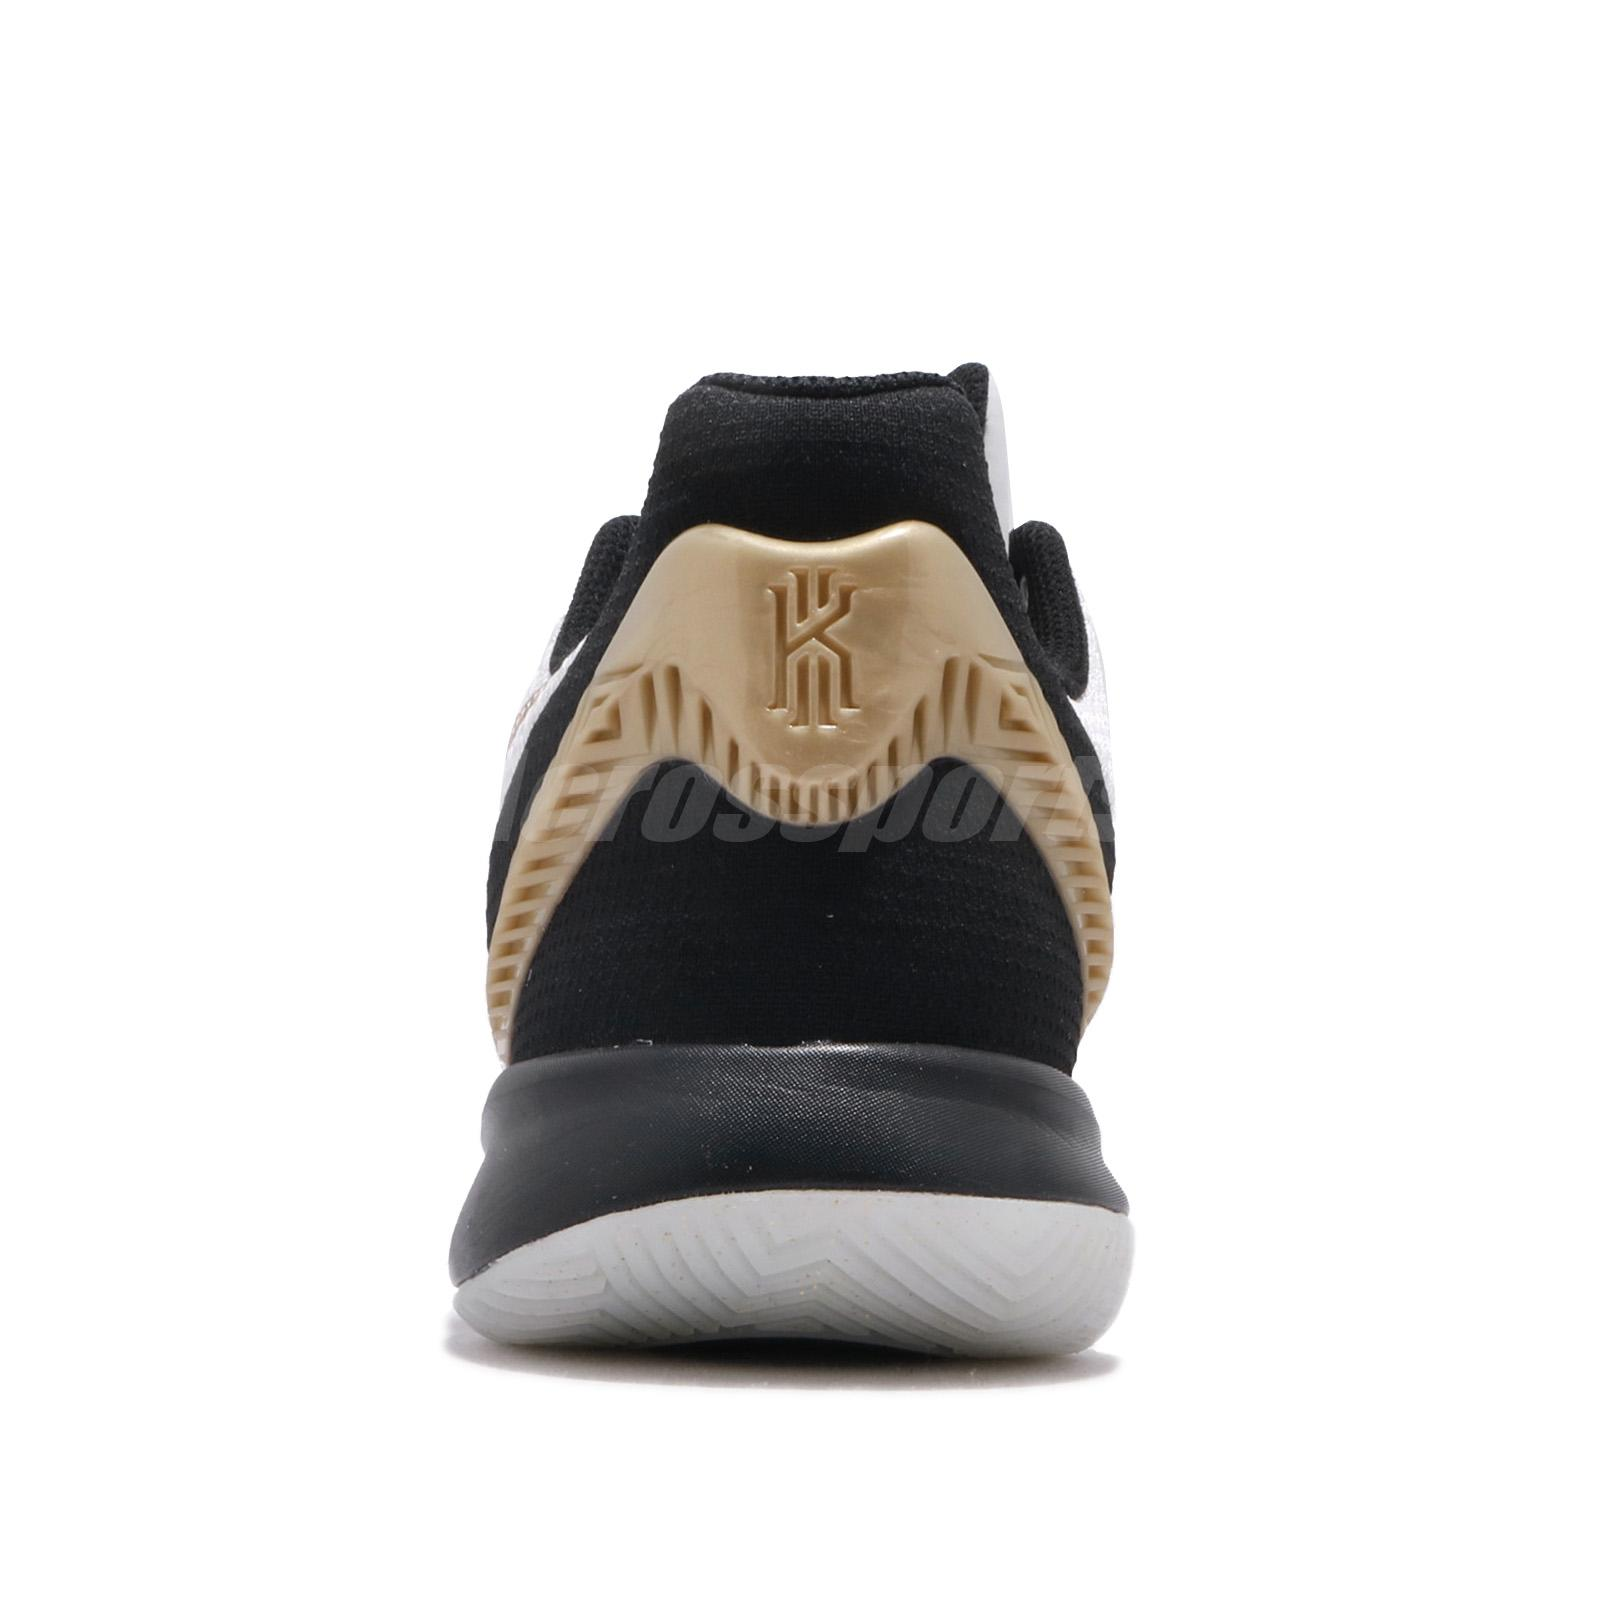 san francisco dcf0a 0003c Nike Kyrie Flytrap II EP 2 White Black Gold Mens Basketball Shoes ...